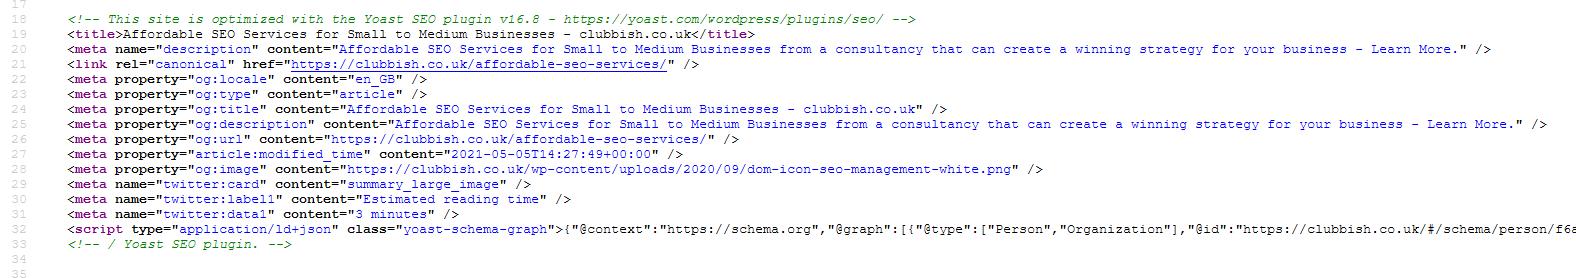 On-page meta data SEO